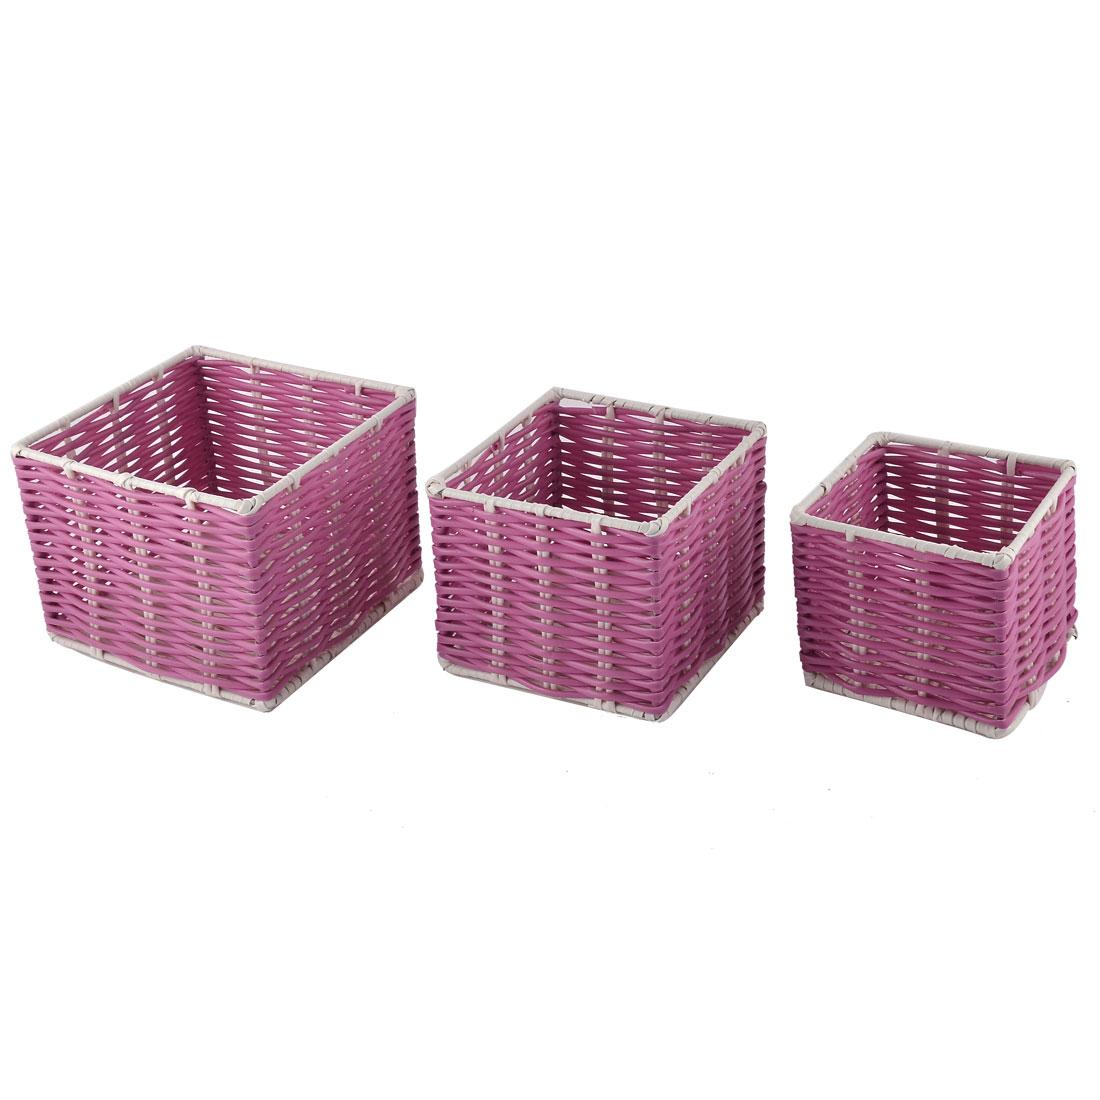 Houseware Dormitory Pencil Pen Plastic Storage Basket Container Holder Fuchsia 3 in 11